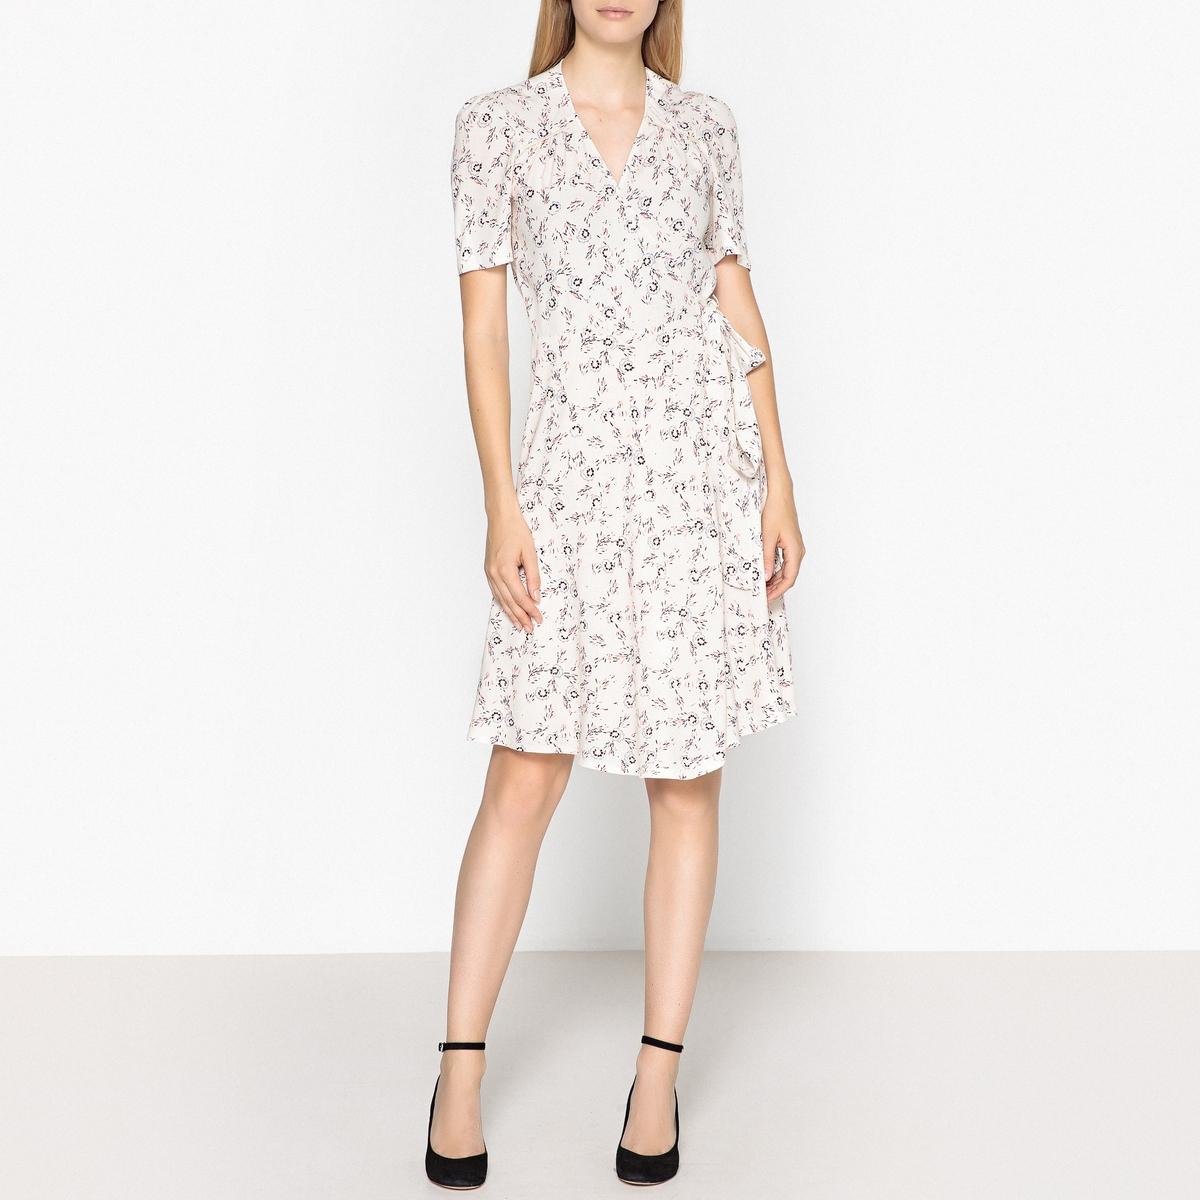 Платье с запахом с рисунком CHICAMA платье с рисунком vestido conkerberry